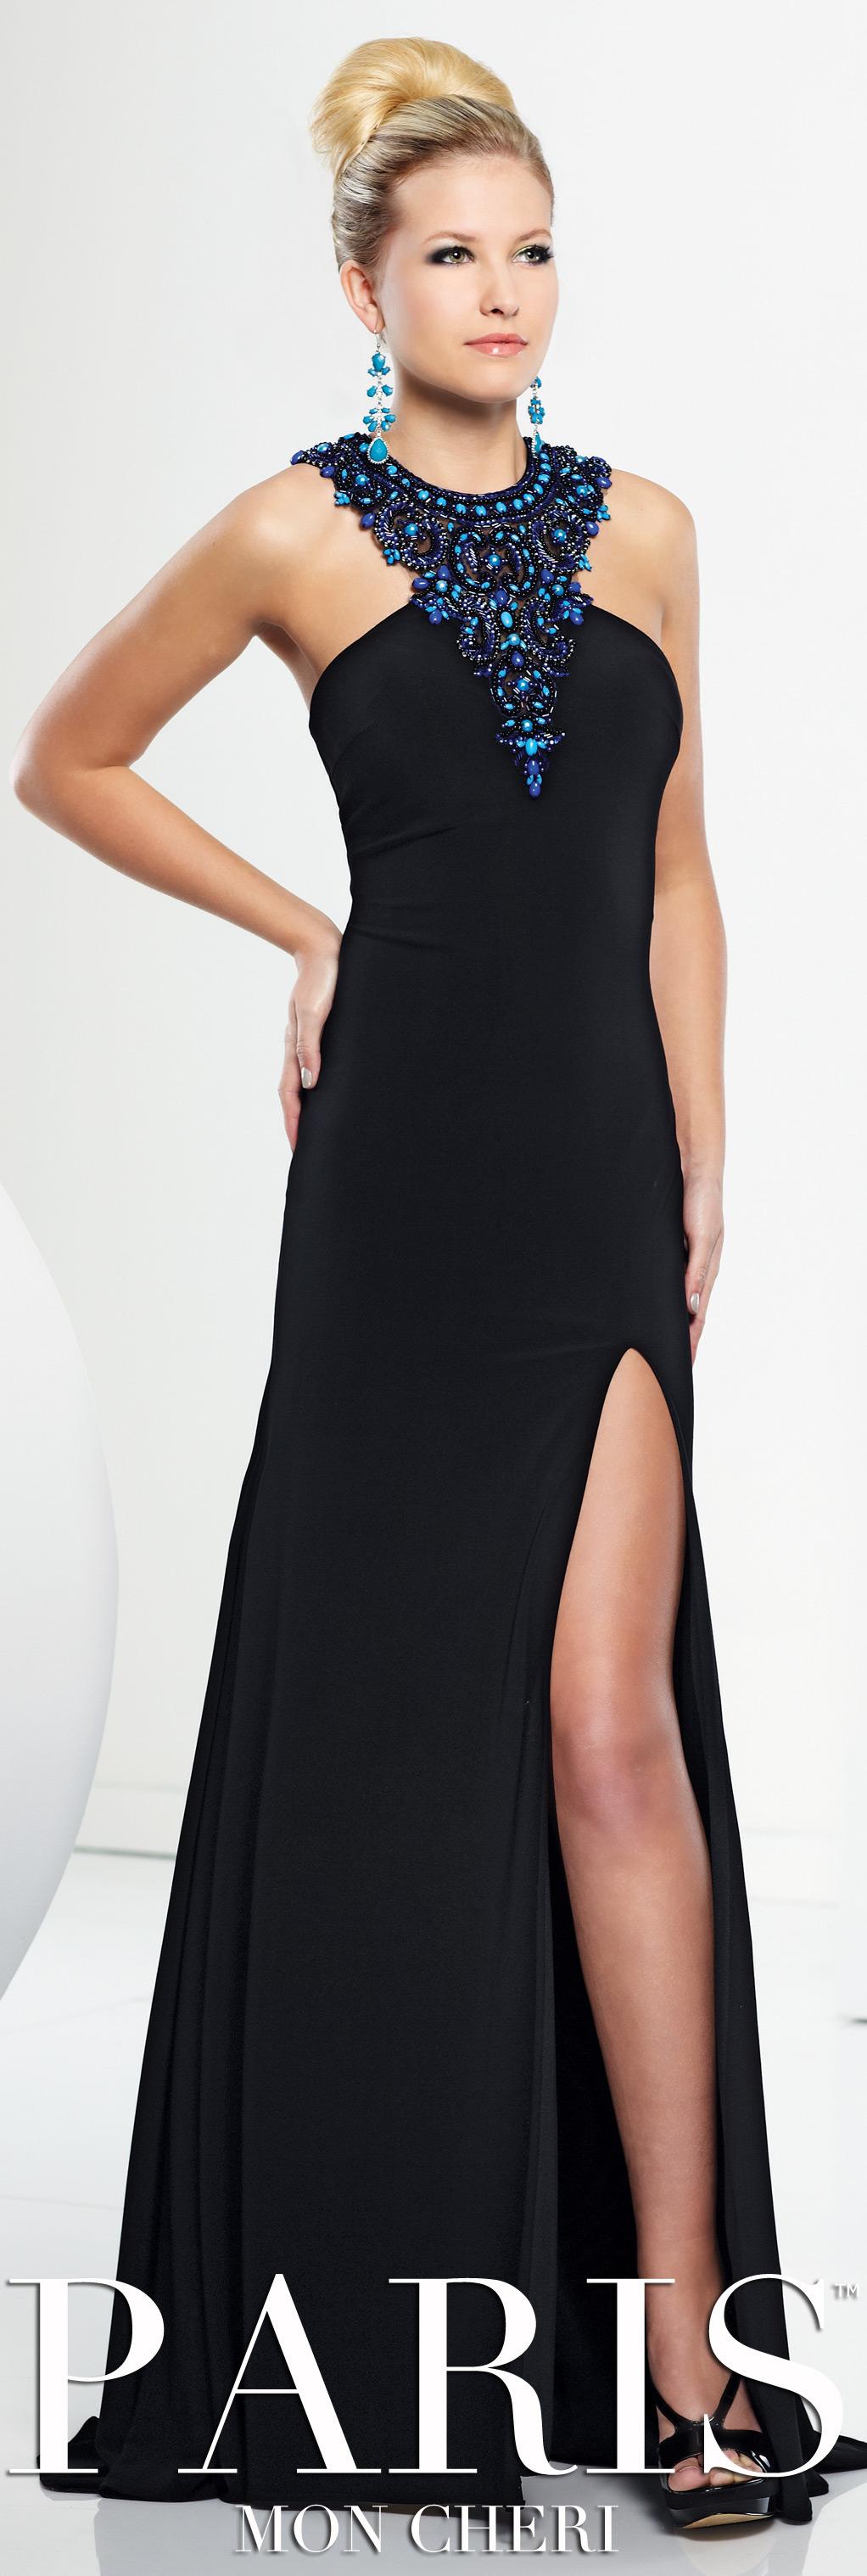 Parismon cheri style black jeweled prom dress